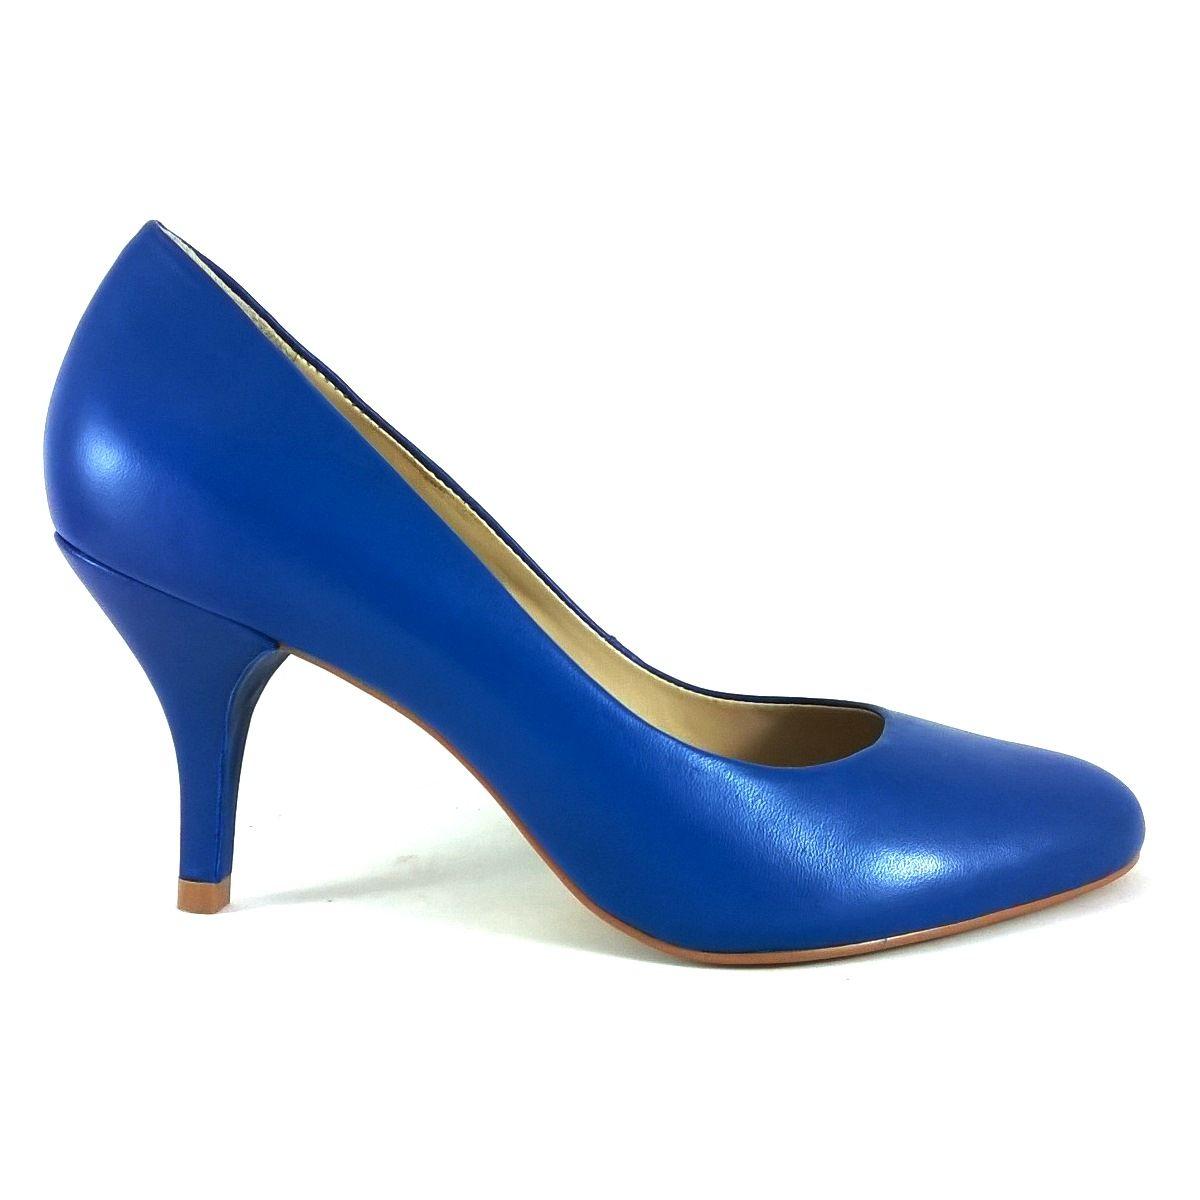 Scarpin Bico Redondo TopGrife Couro Azul  - SAPATOWEB.COM